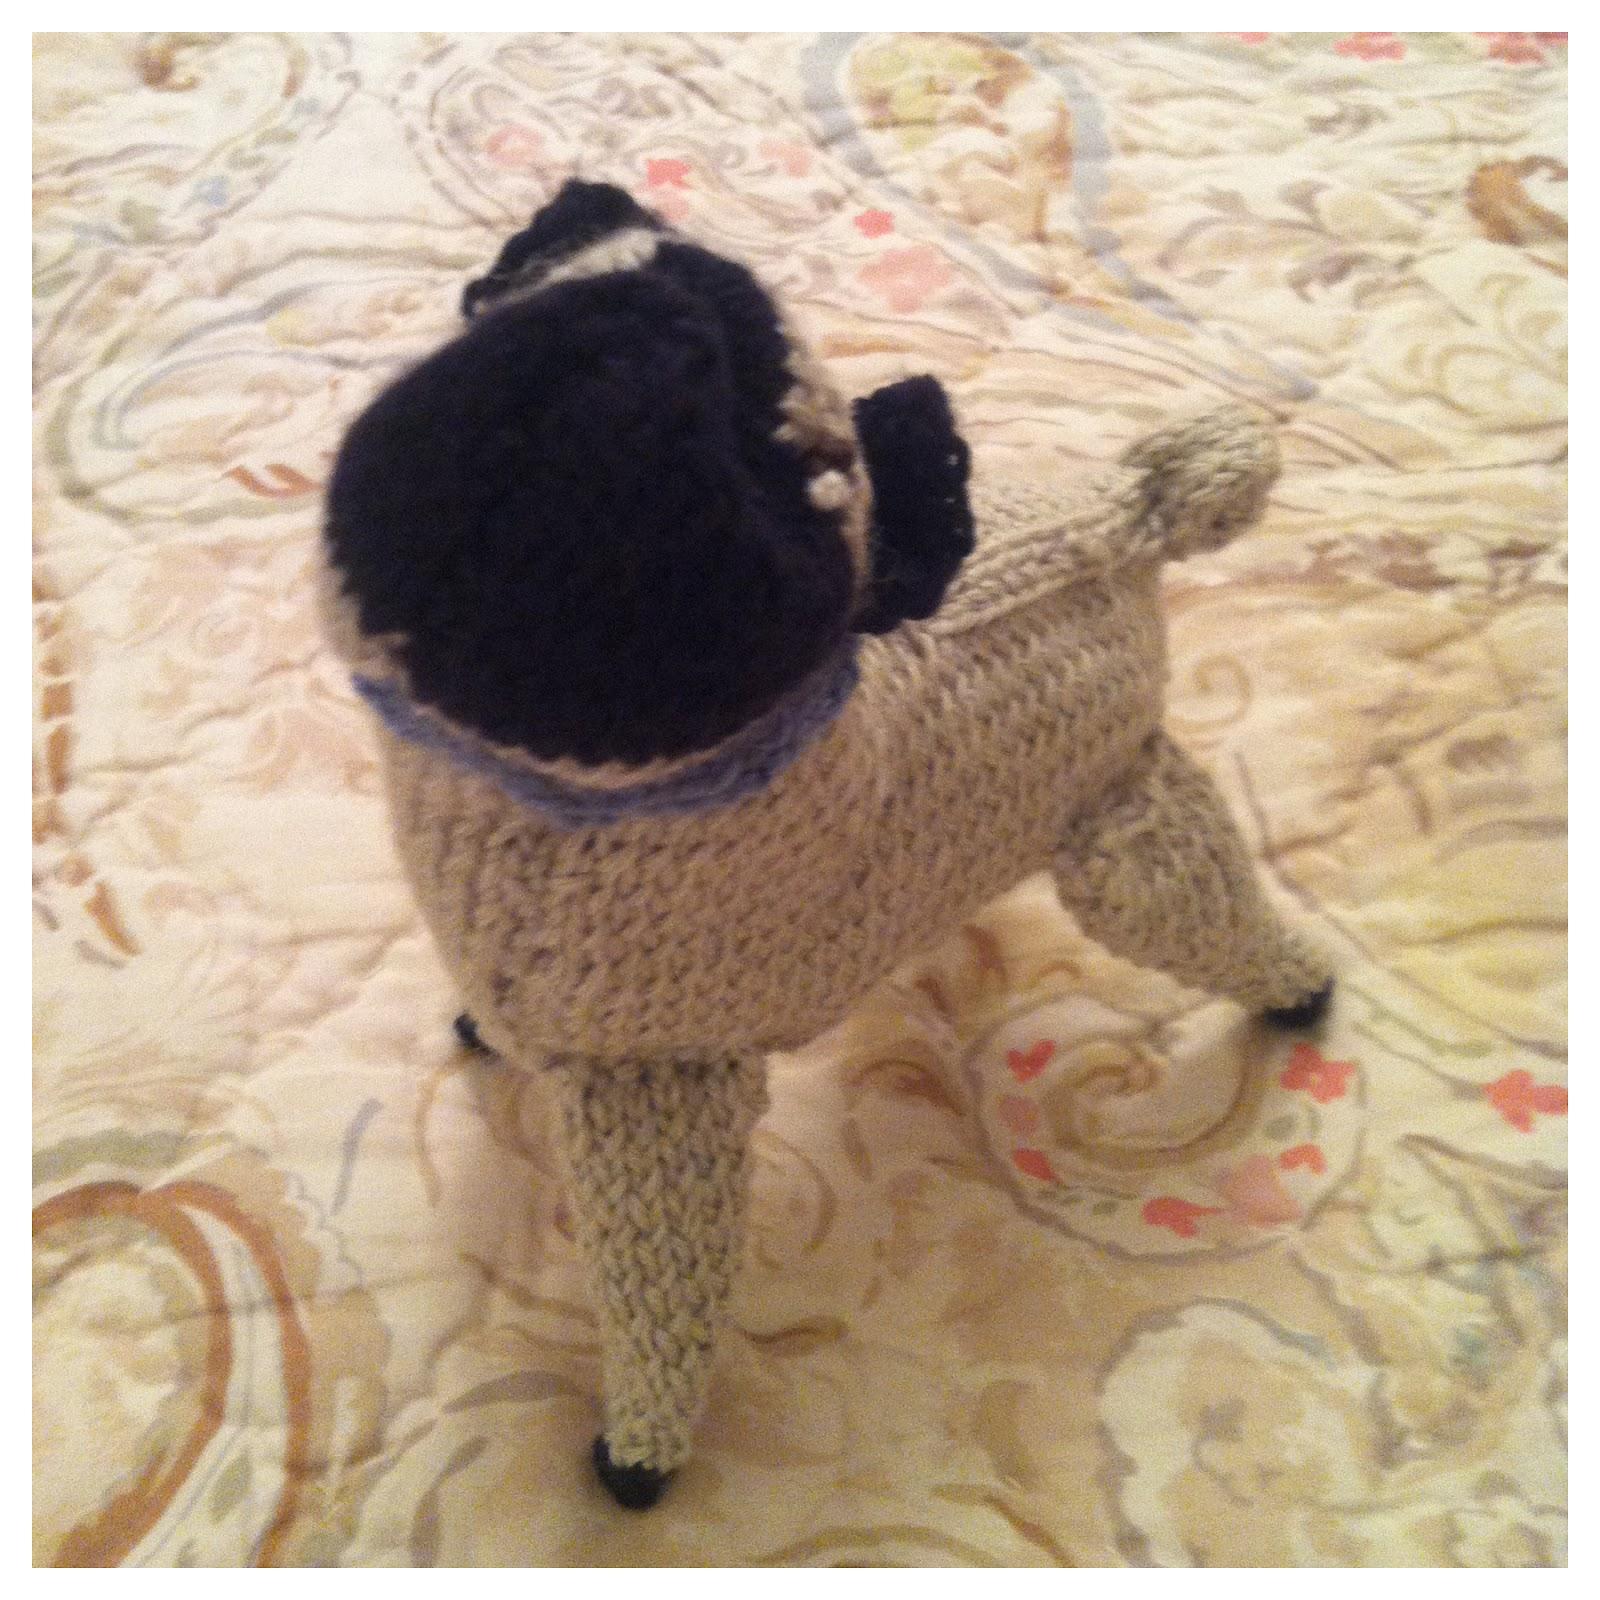 anna knits, etc.: anna knits - knit pug update 3